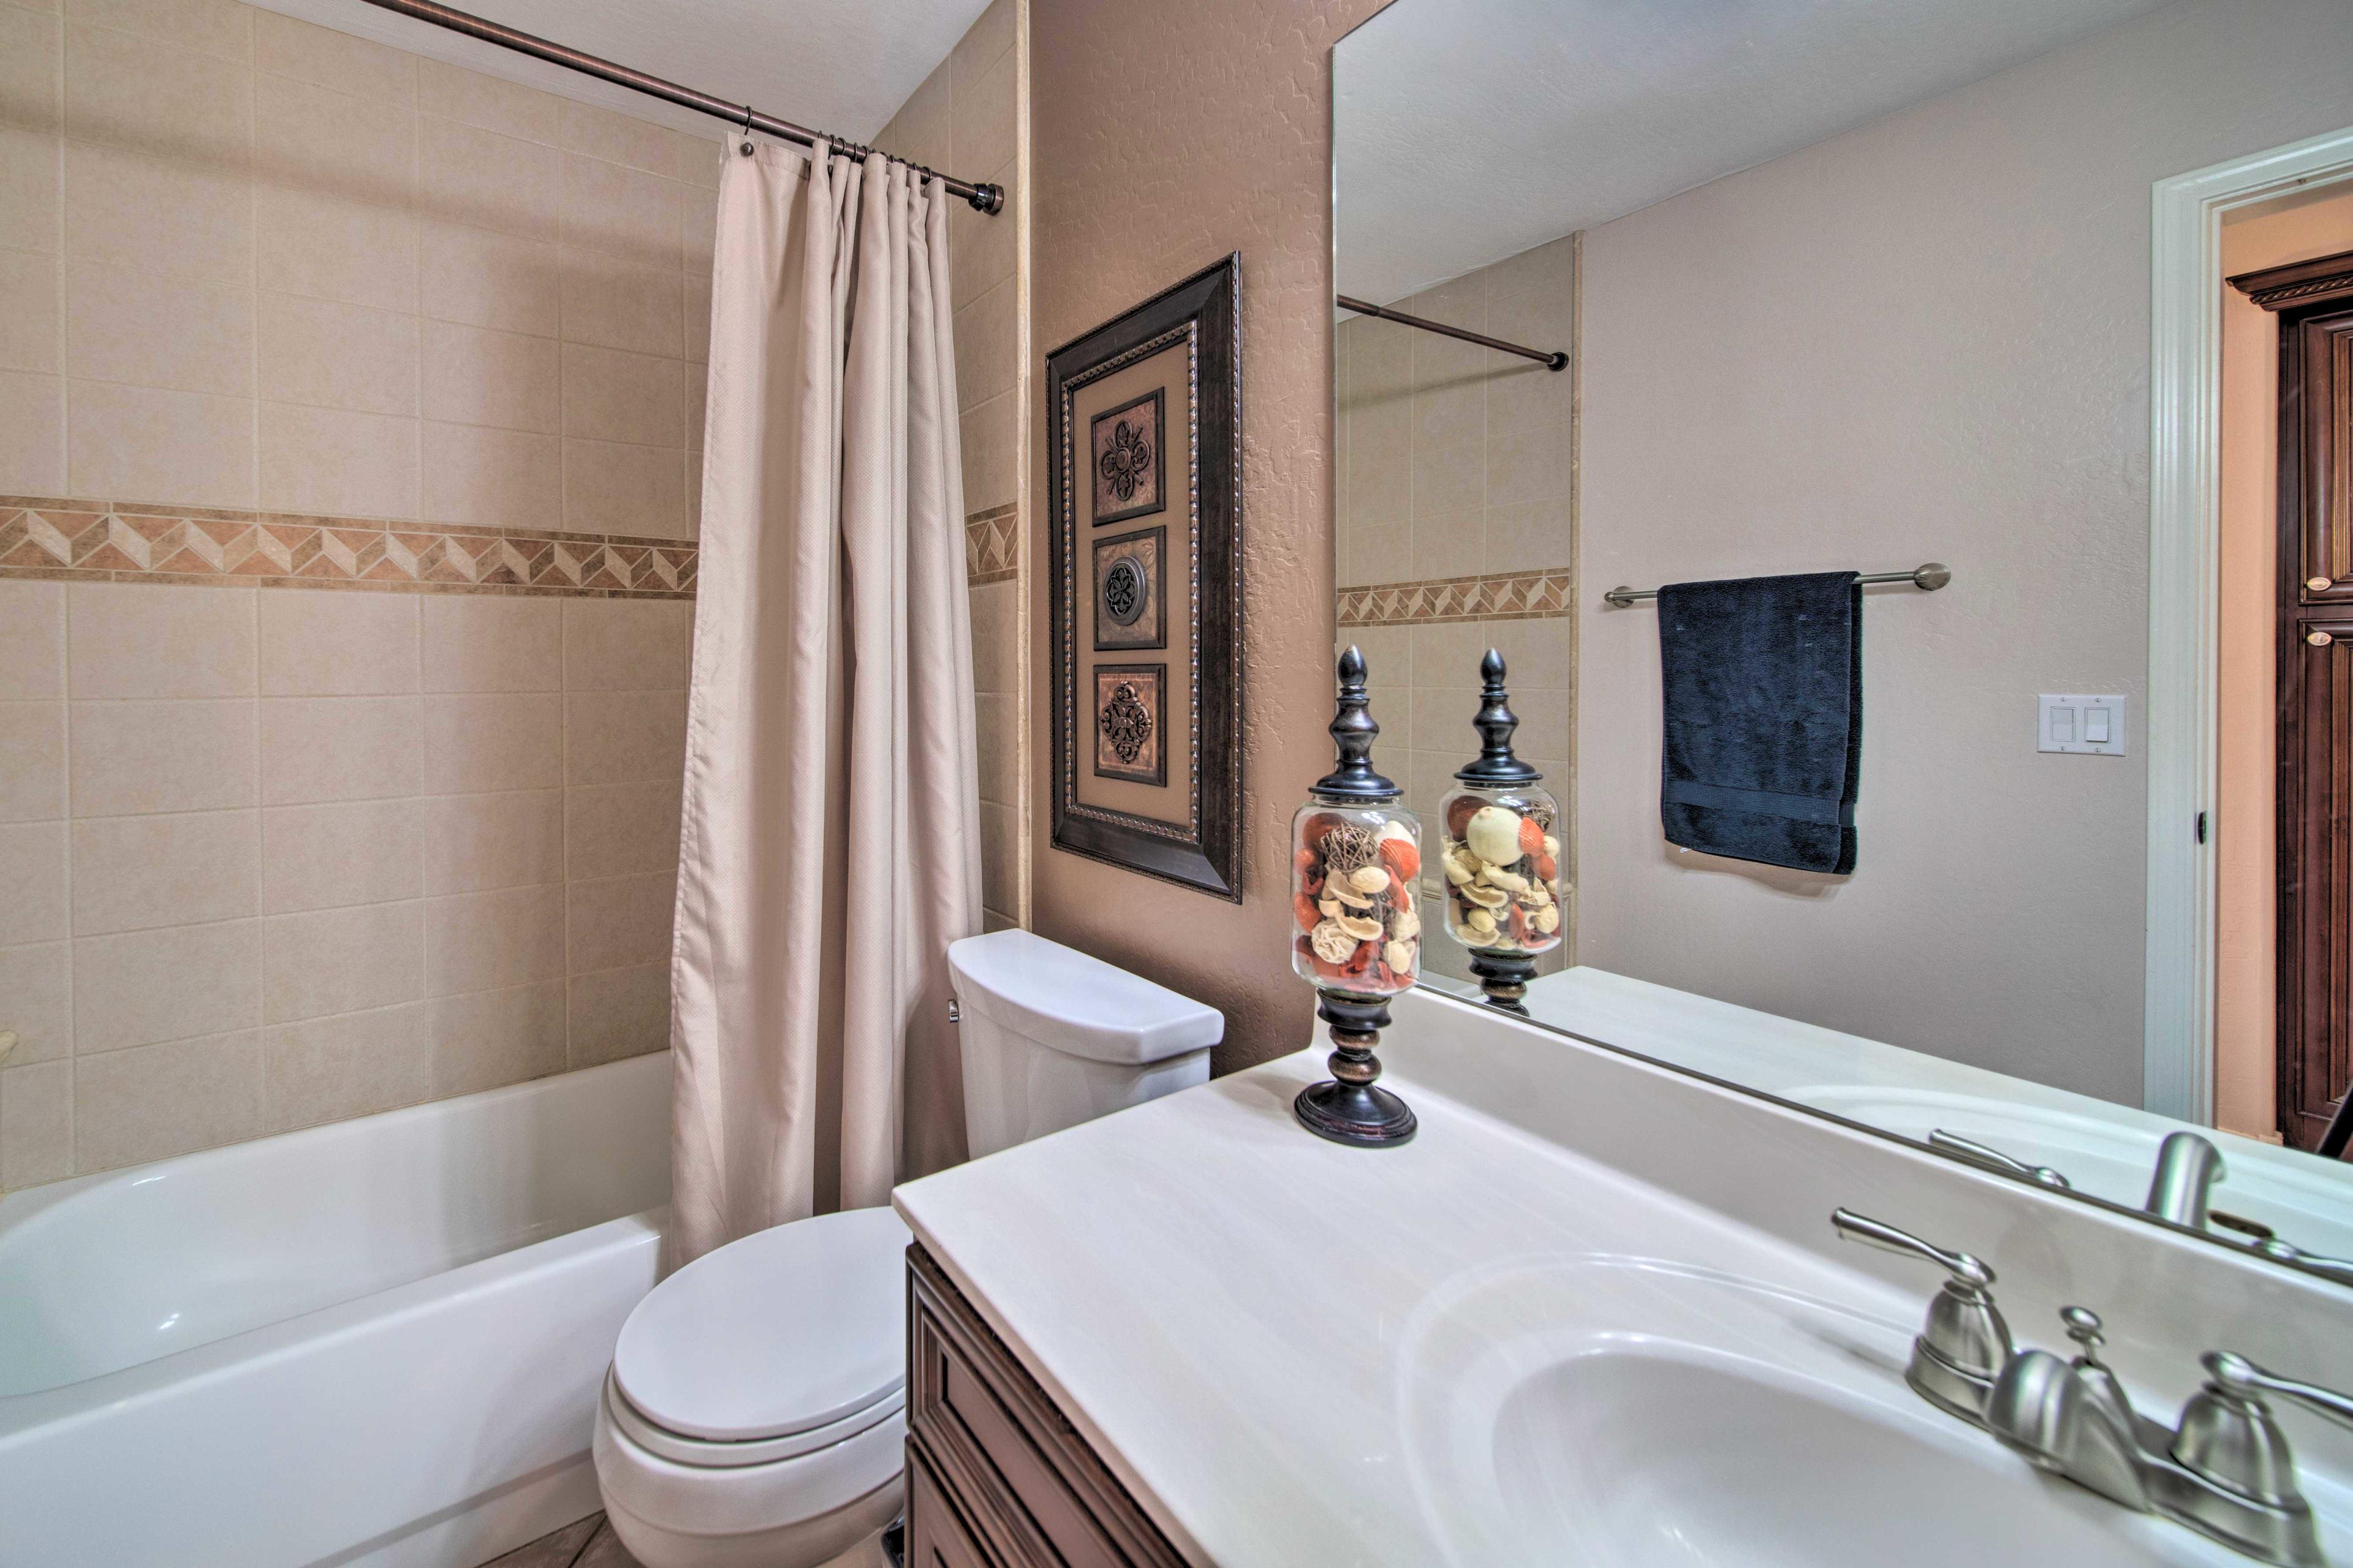 Full Bathroom | Shower/Tub Combo | Towels Provided